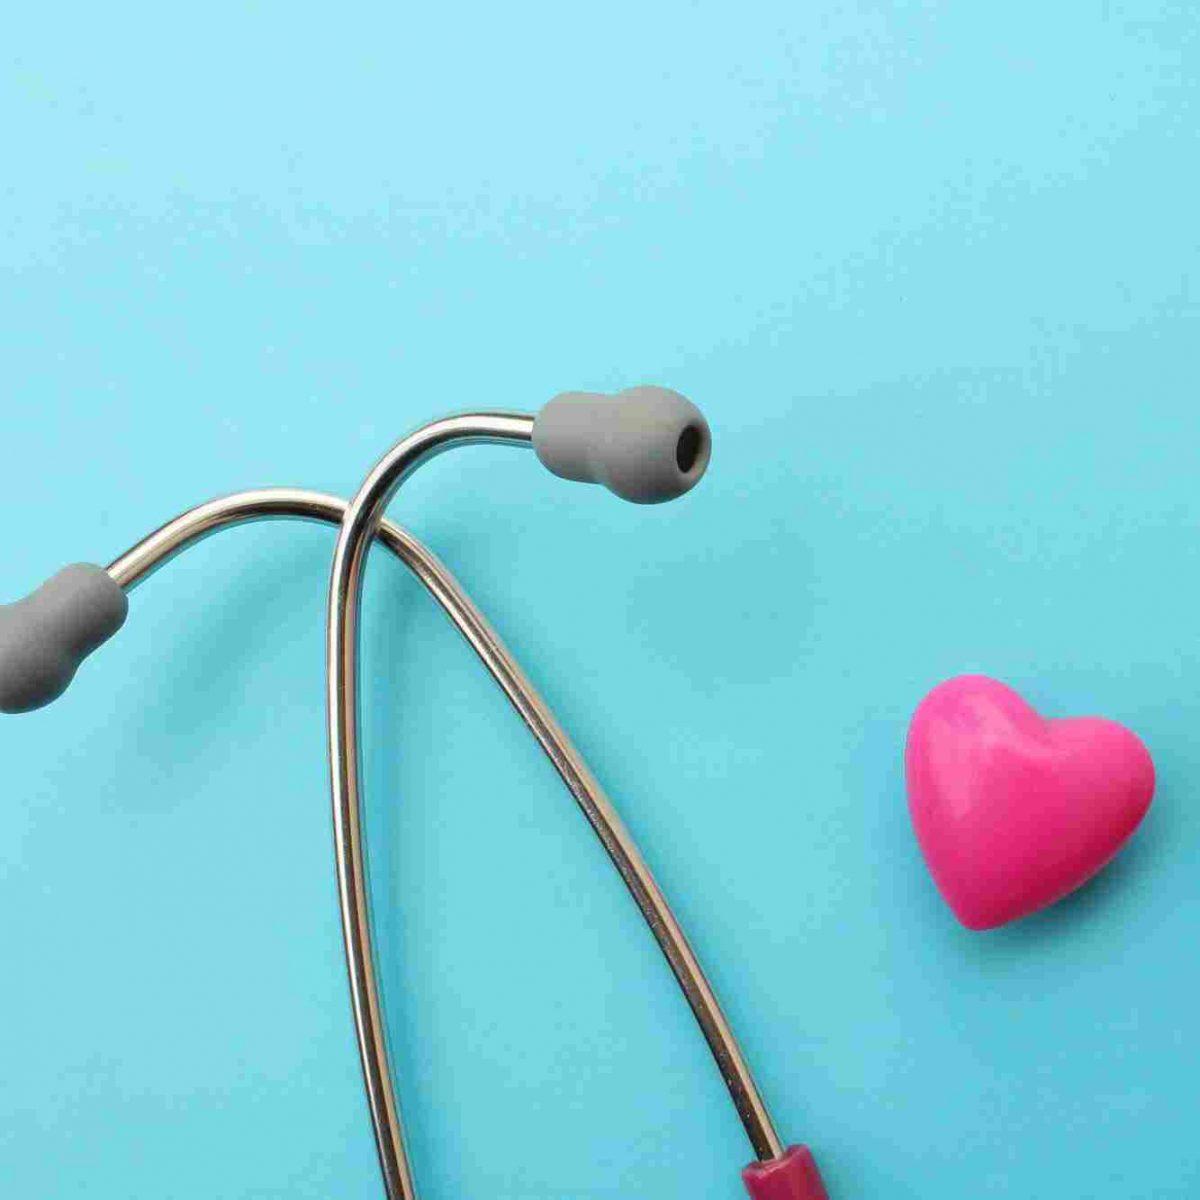 srce i stetoskop 1200x1200 - Services